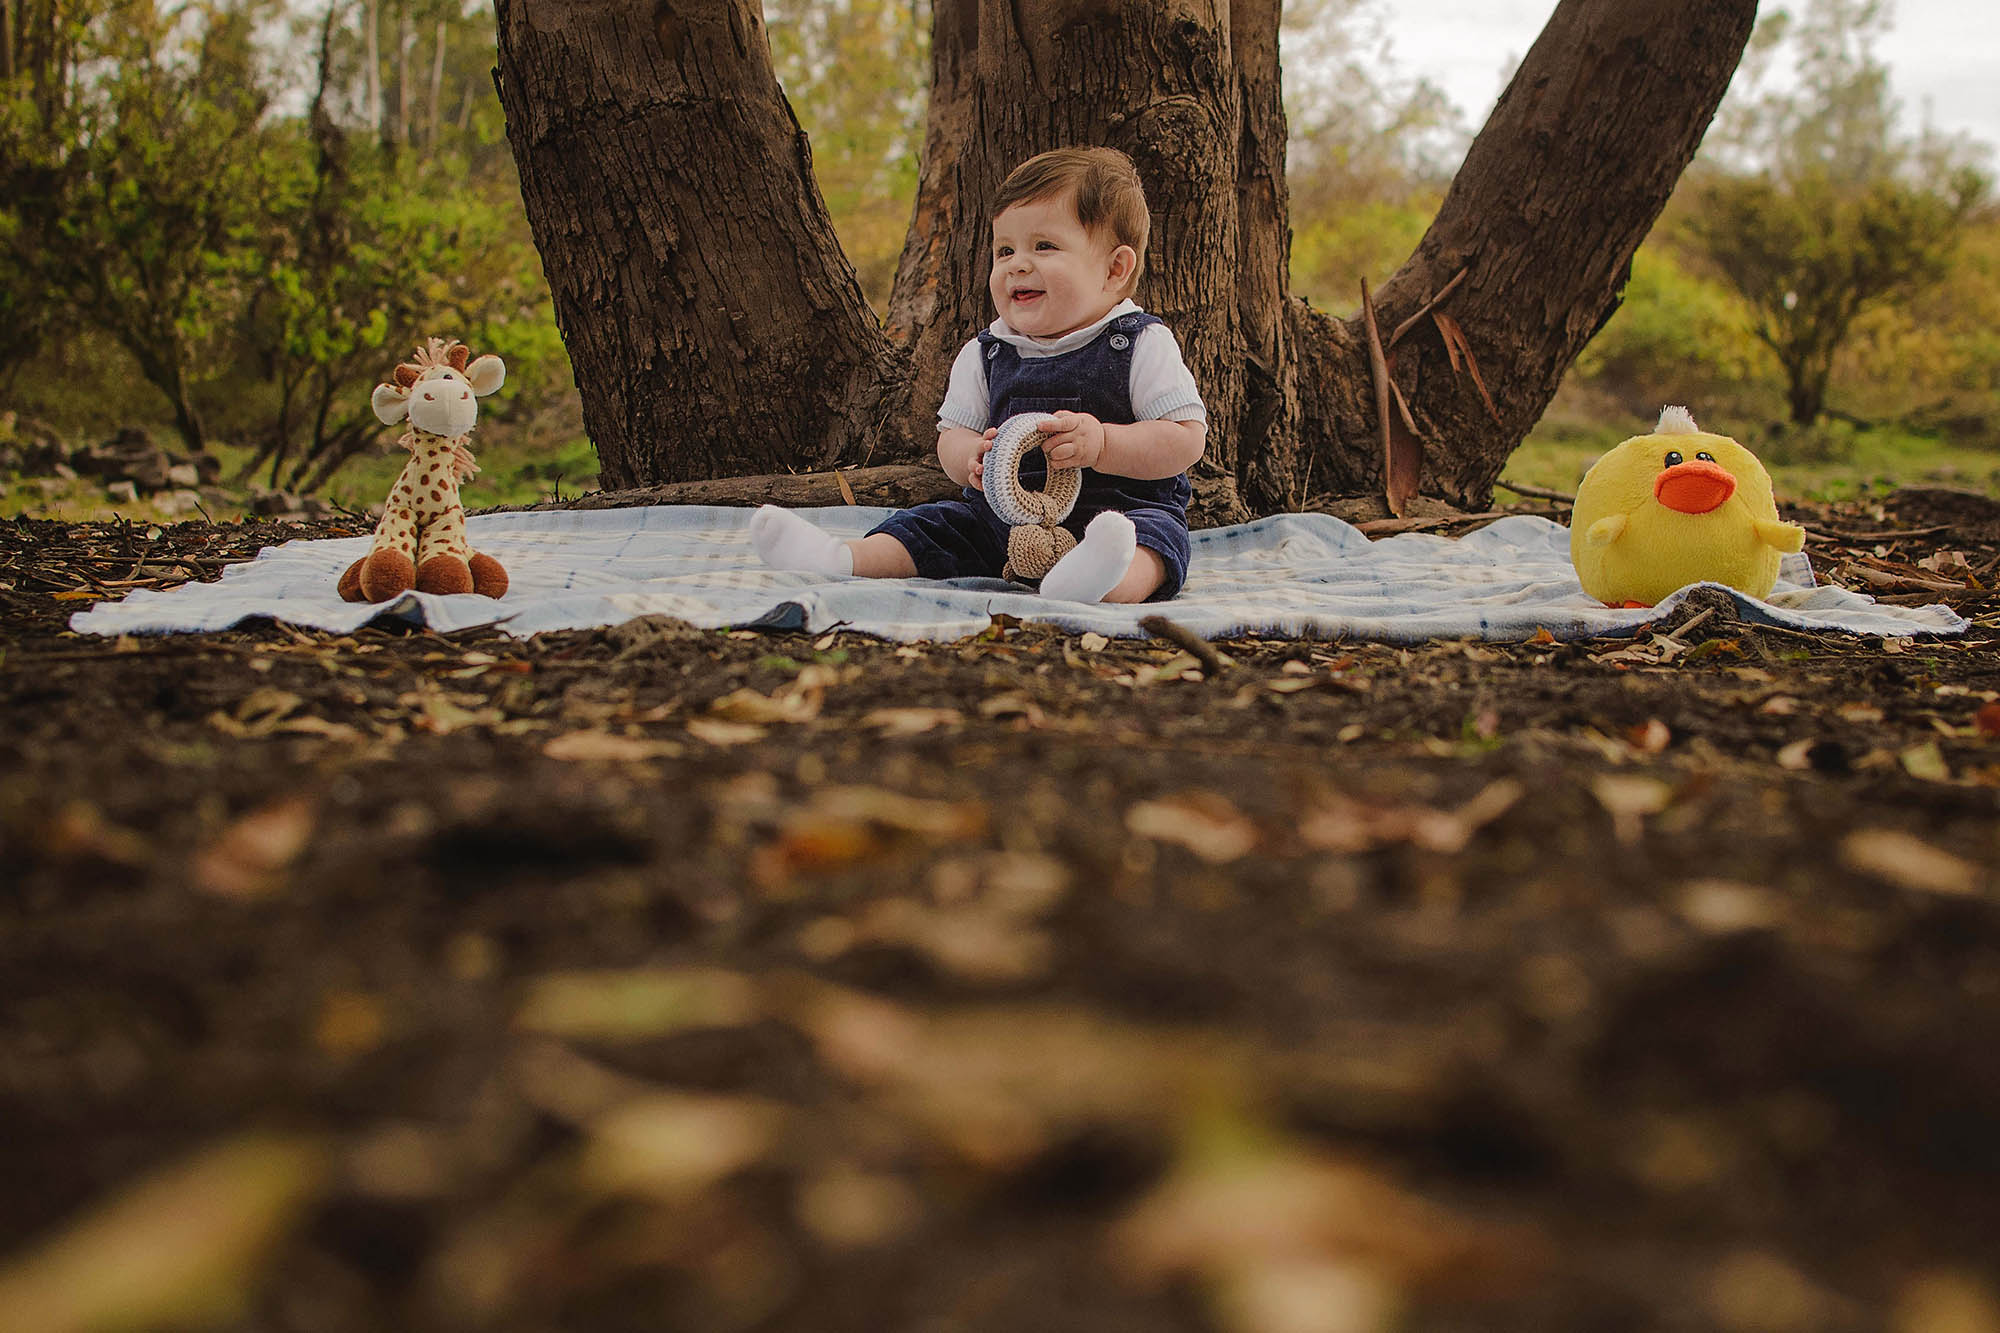 fotografo-de-familia-Queretaro-Emiliano-6.jpg